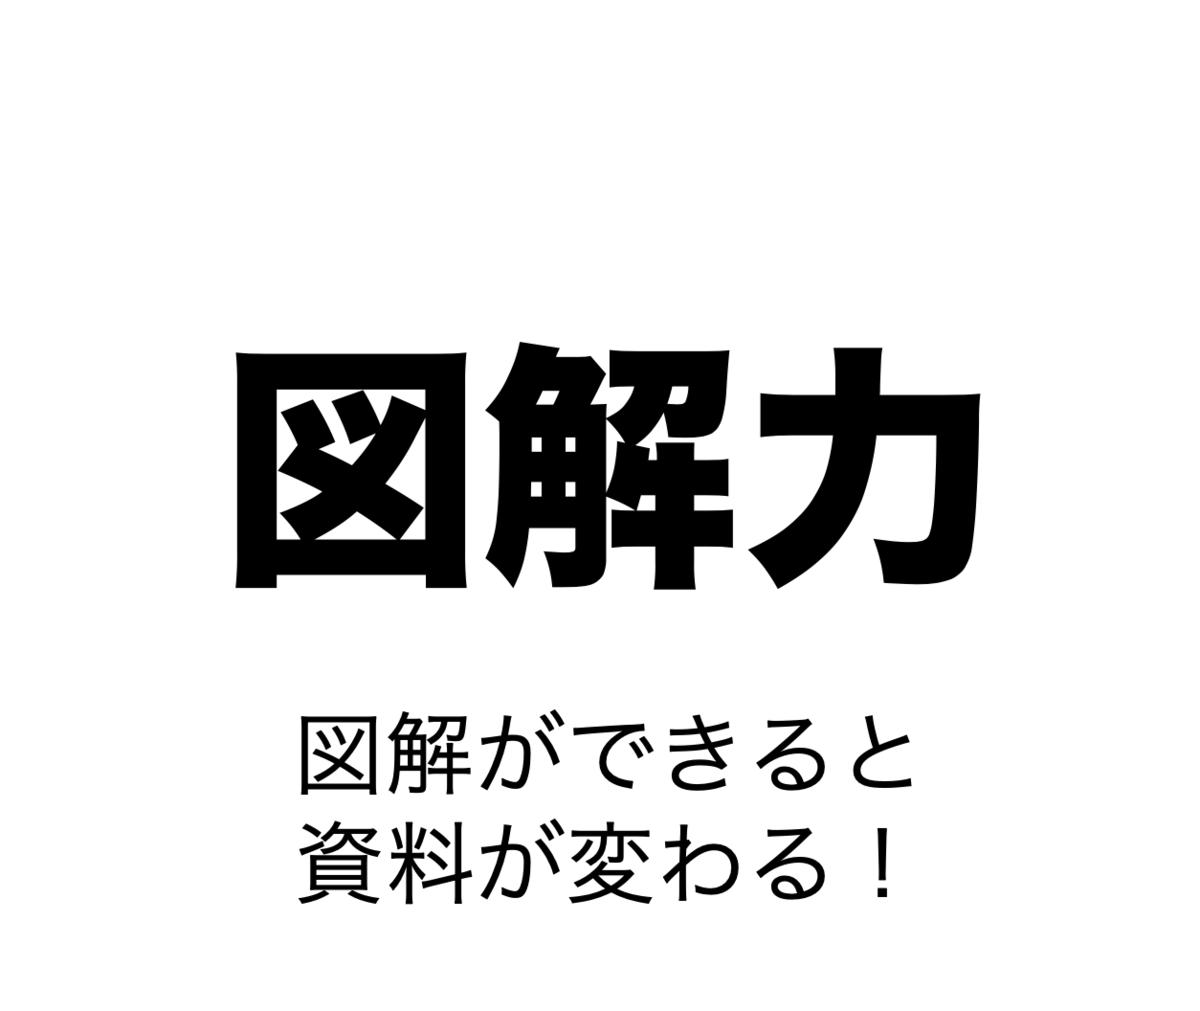 f:id:presen-sen-nin:20200313145912p:plain